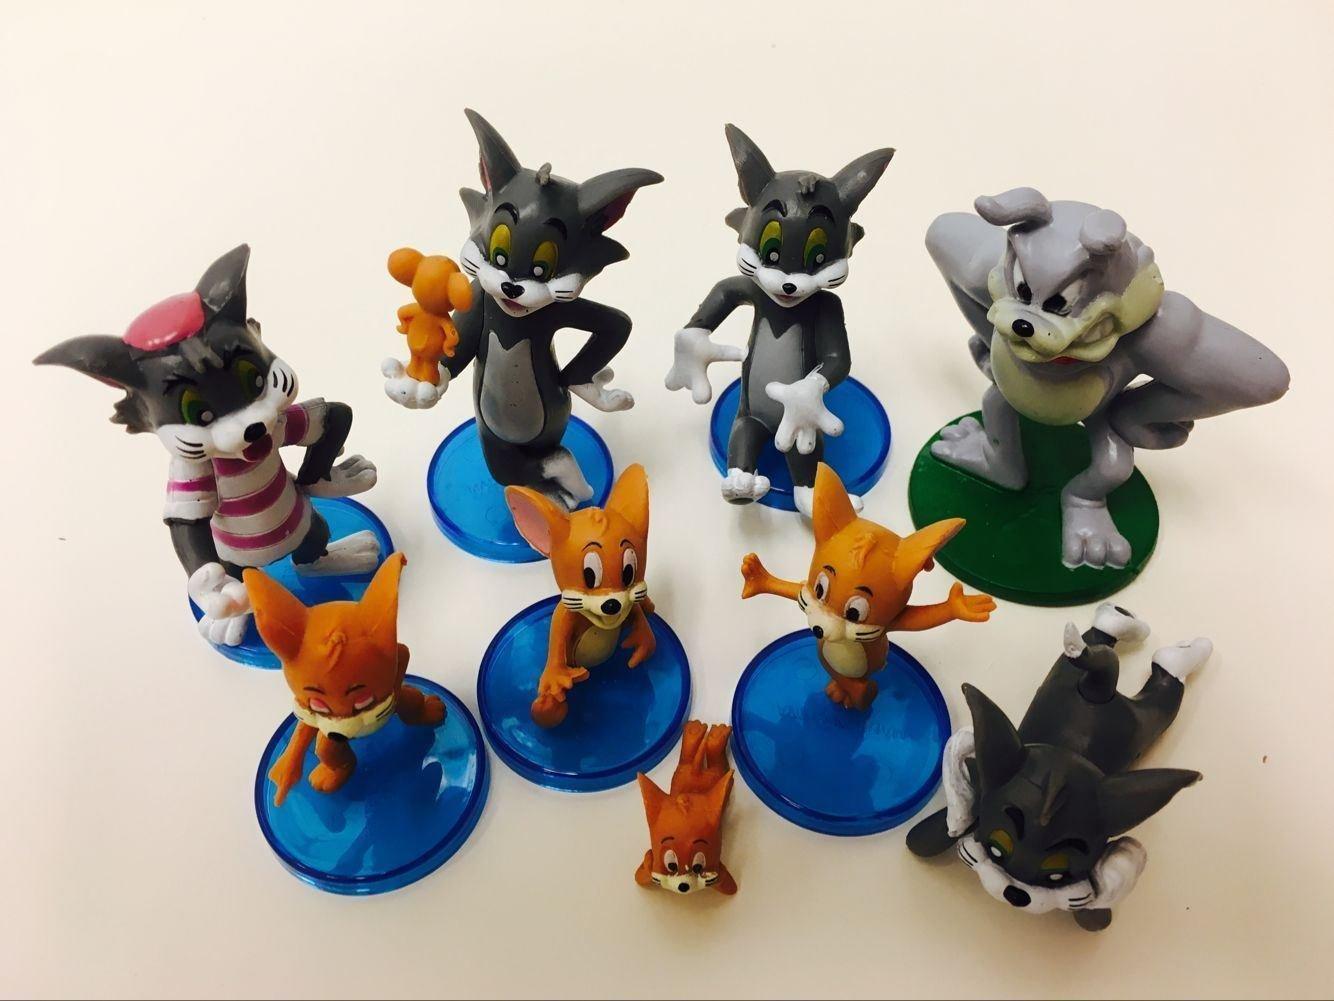 Amazon.com: 9pcs Set Tom y Jerry Mini Figures Cartoon Kids ...